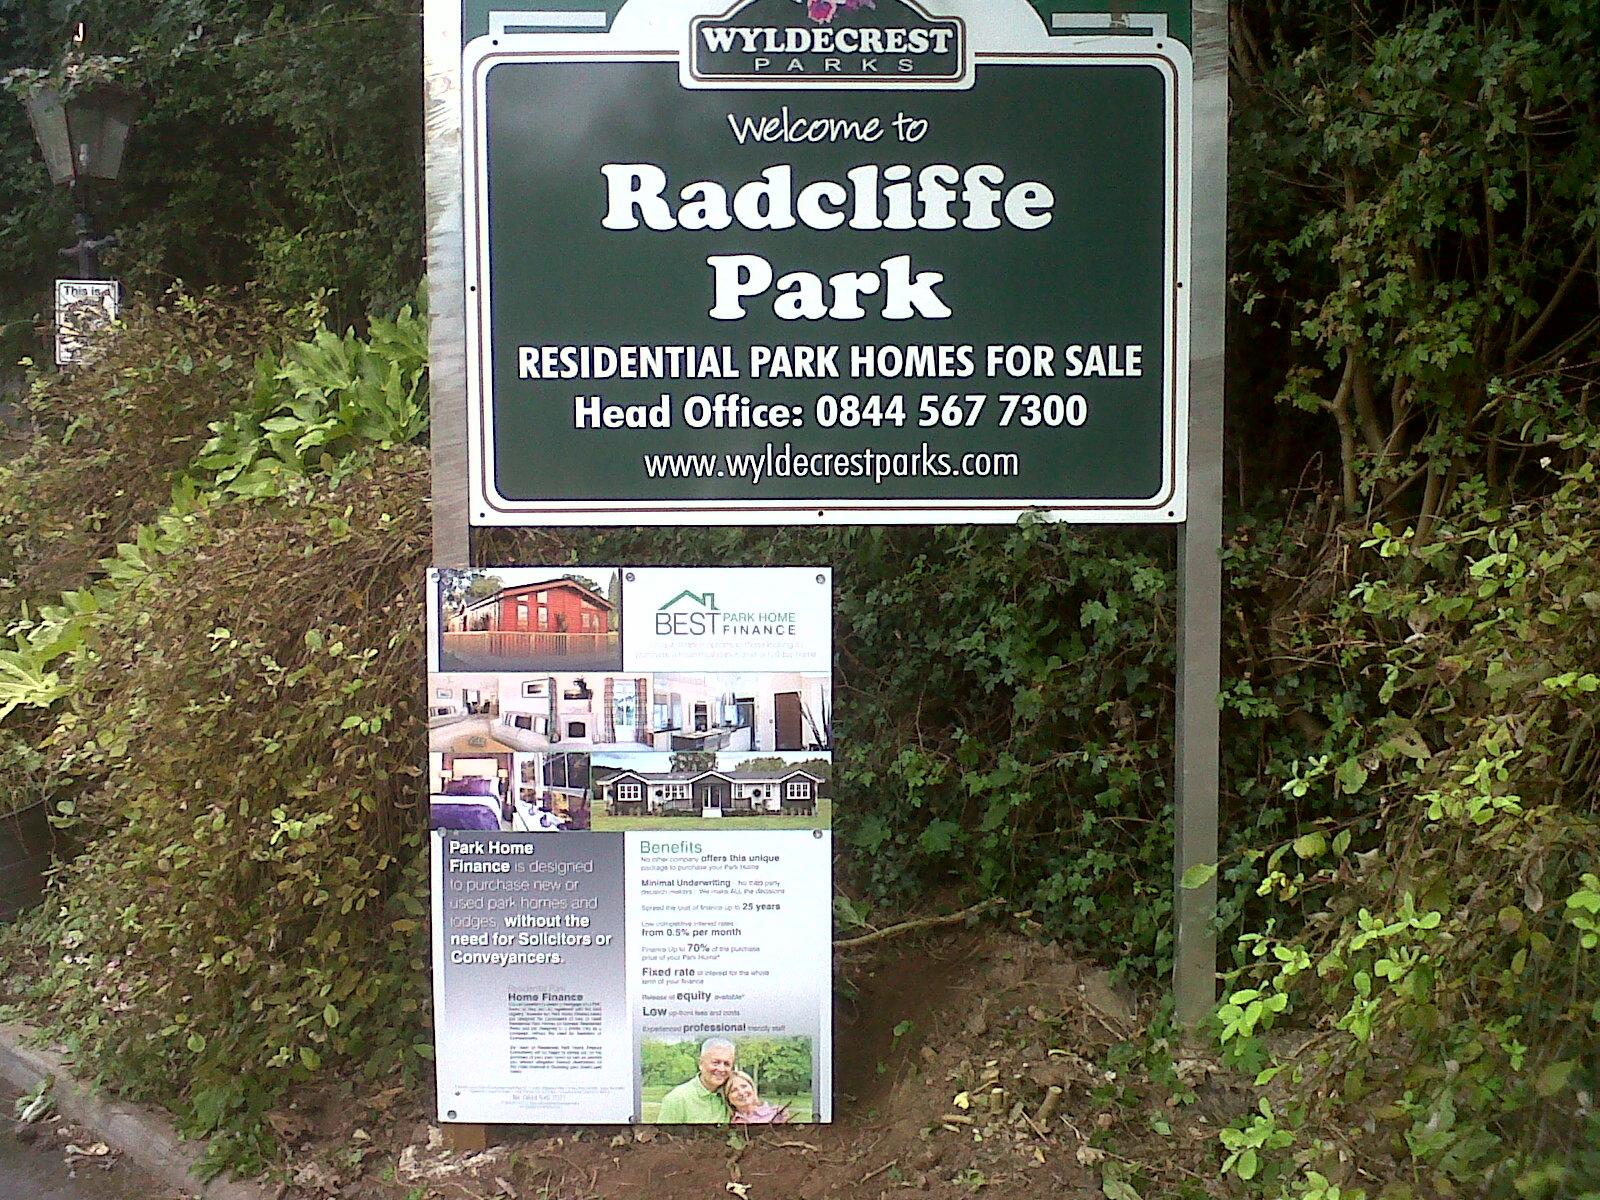 BEST Park Home Finance Makes Debut At Radcliffe